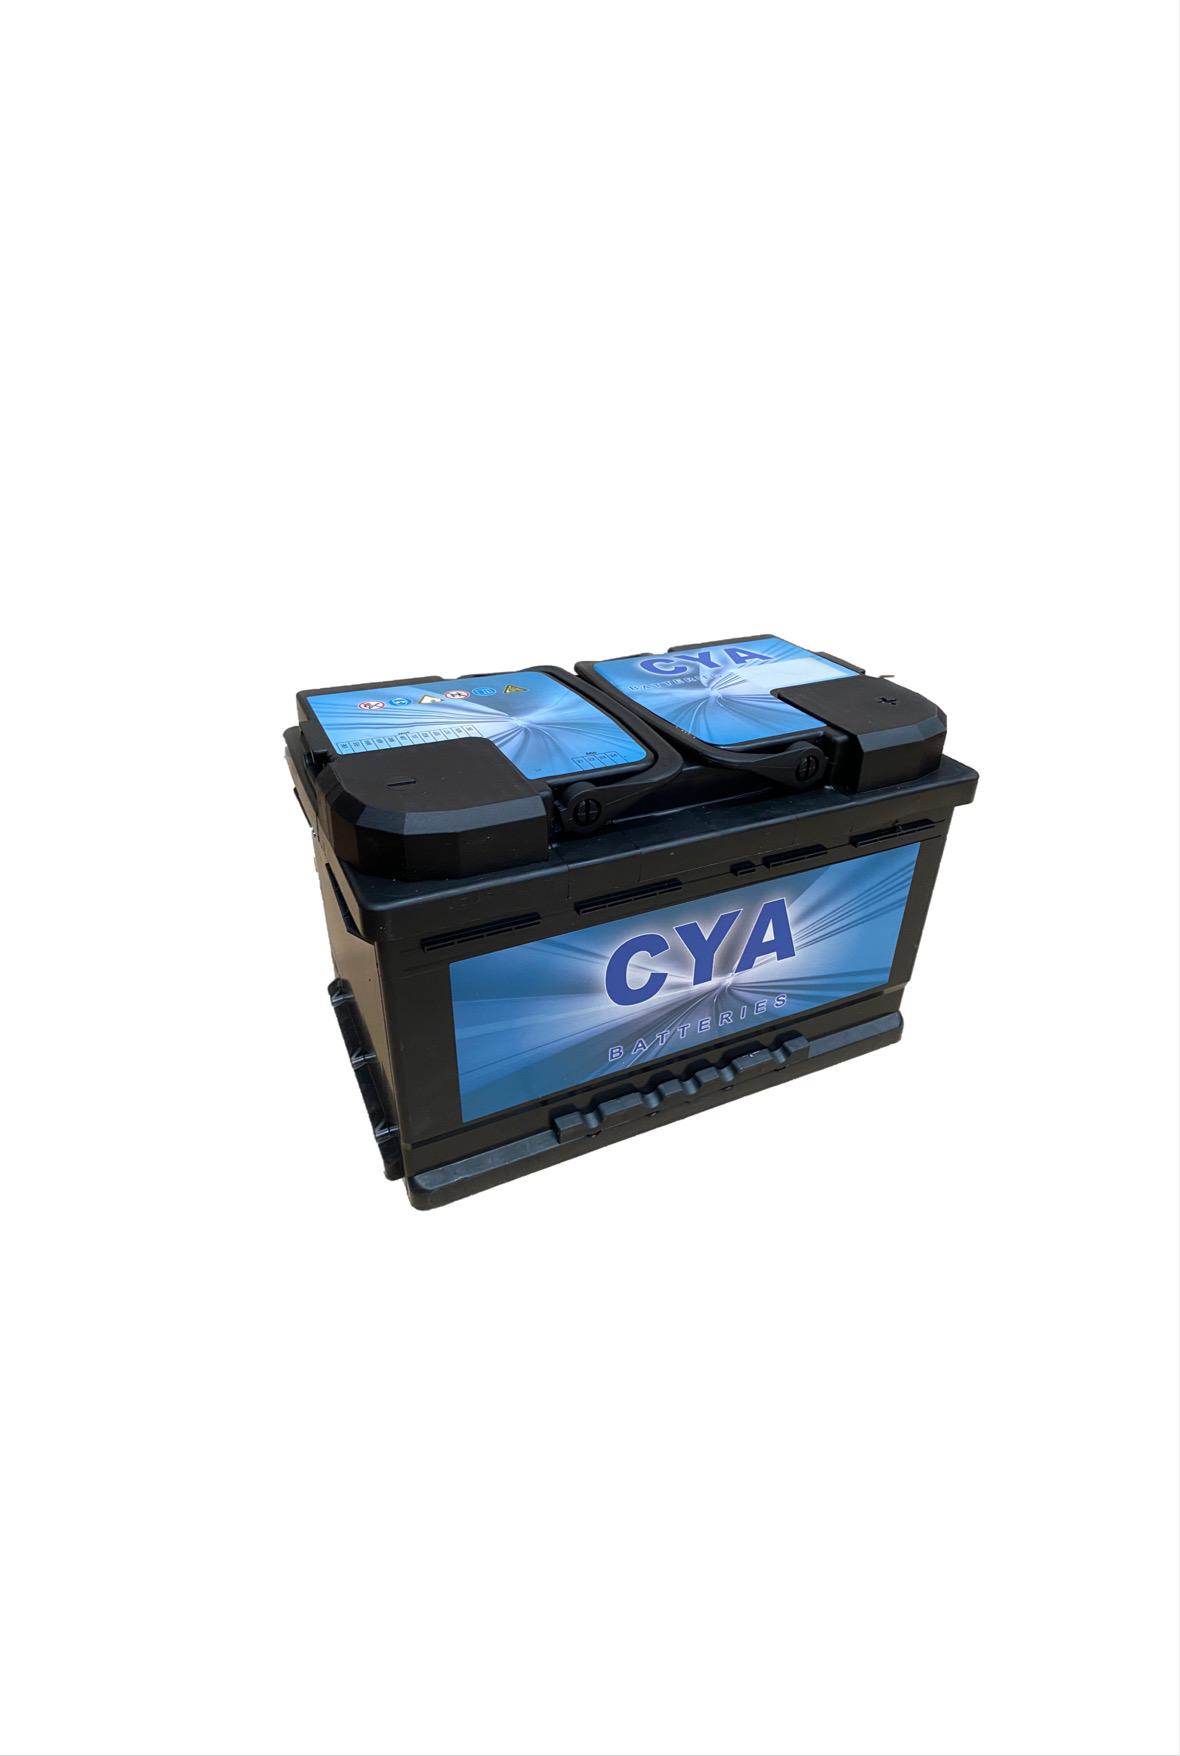 Bateria CYA 45 Ah. Japonesa